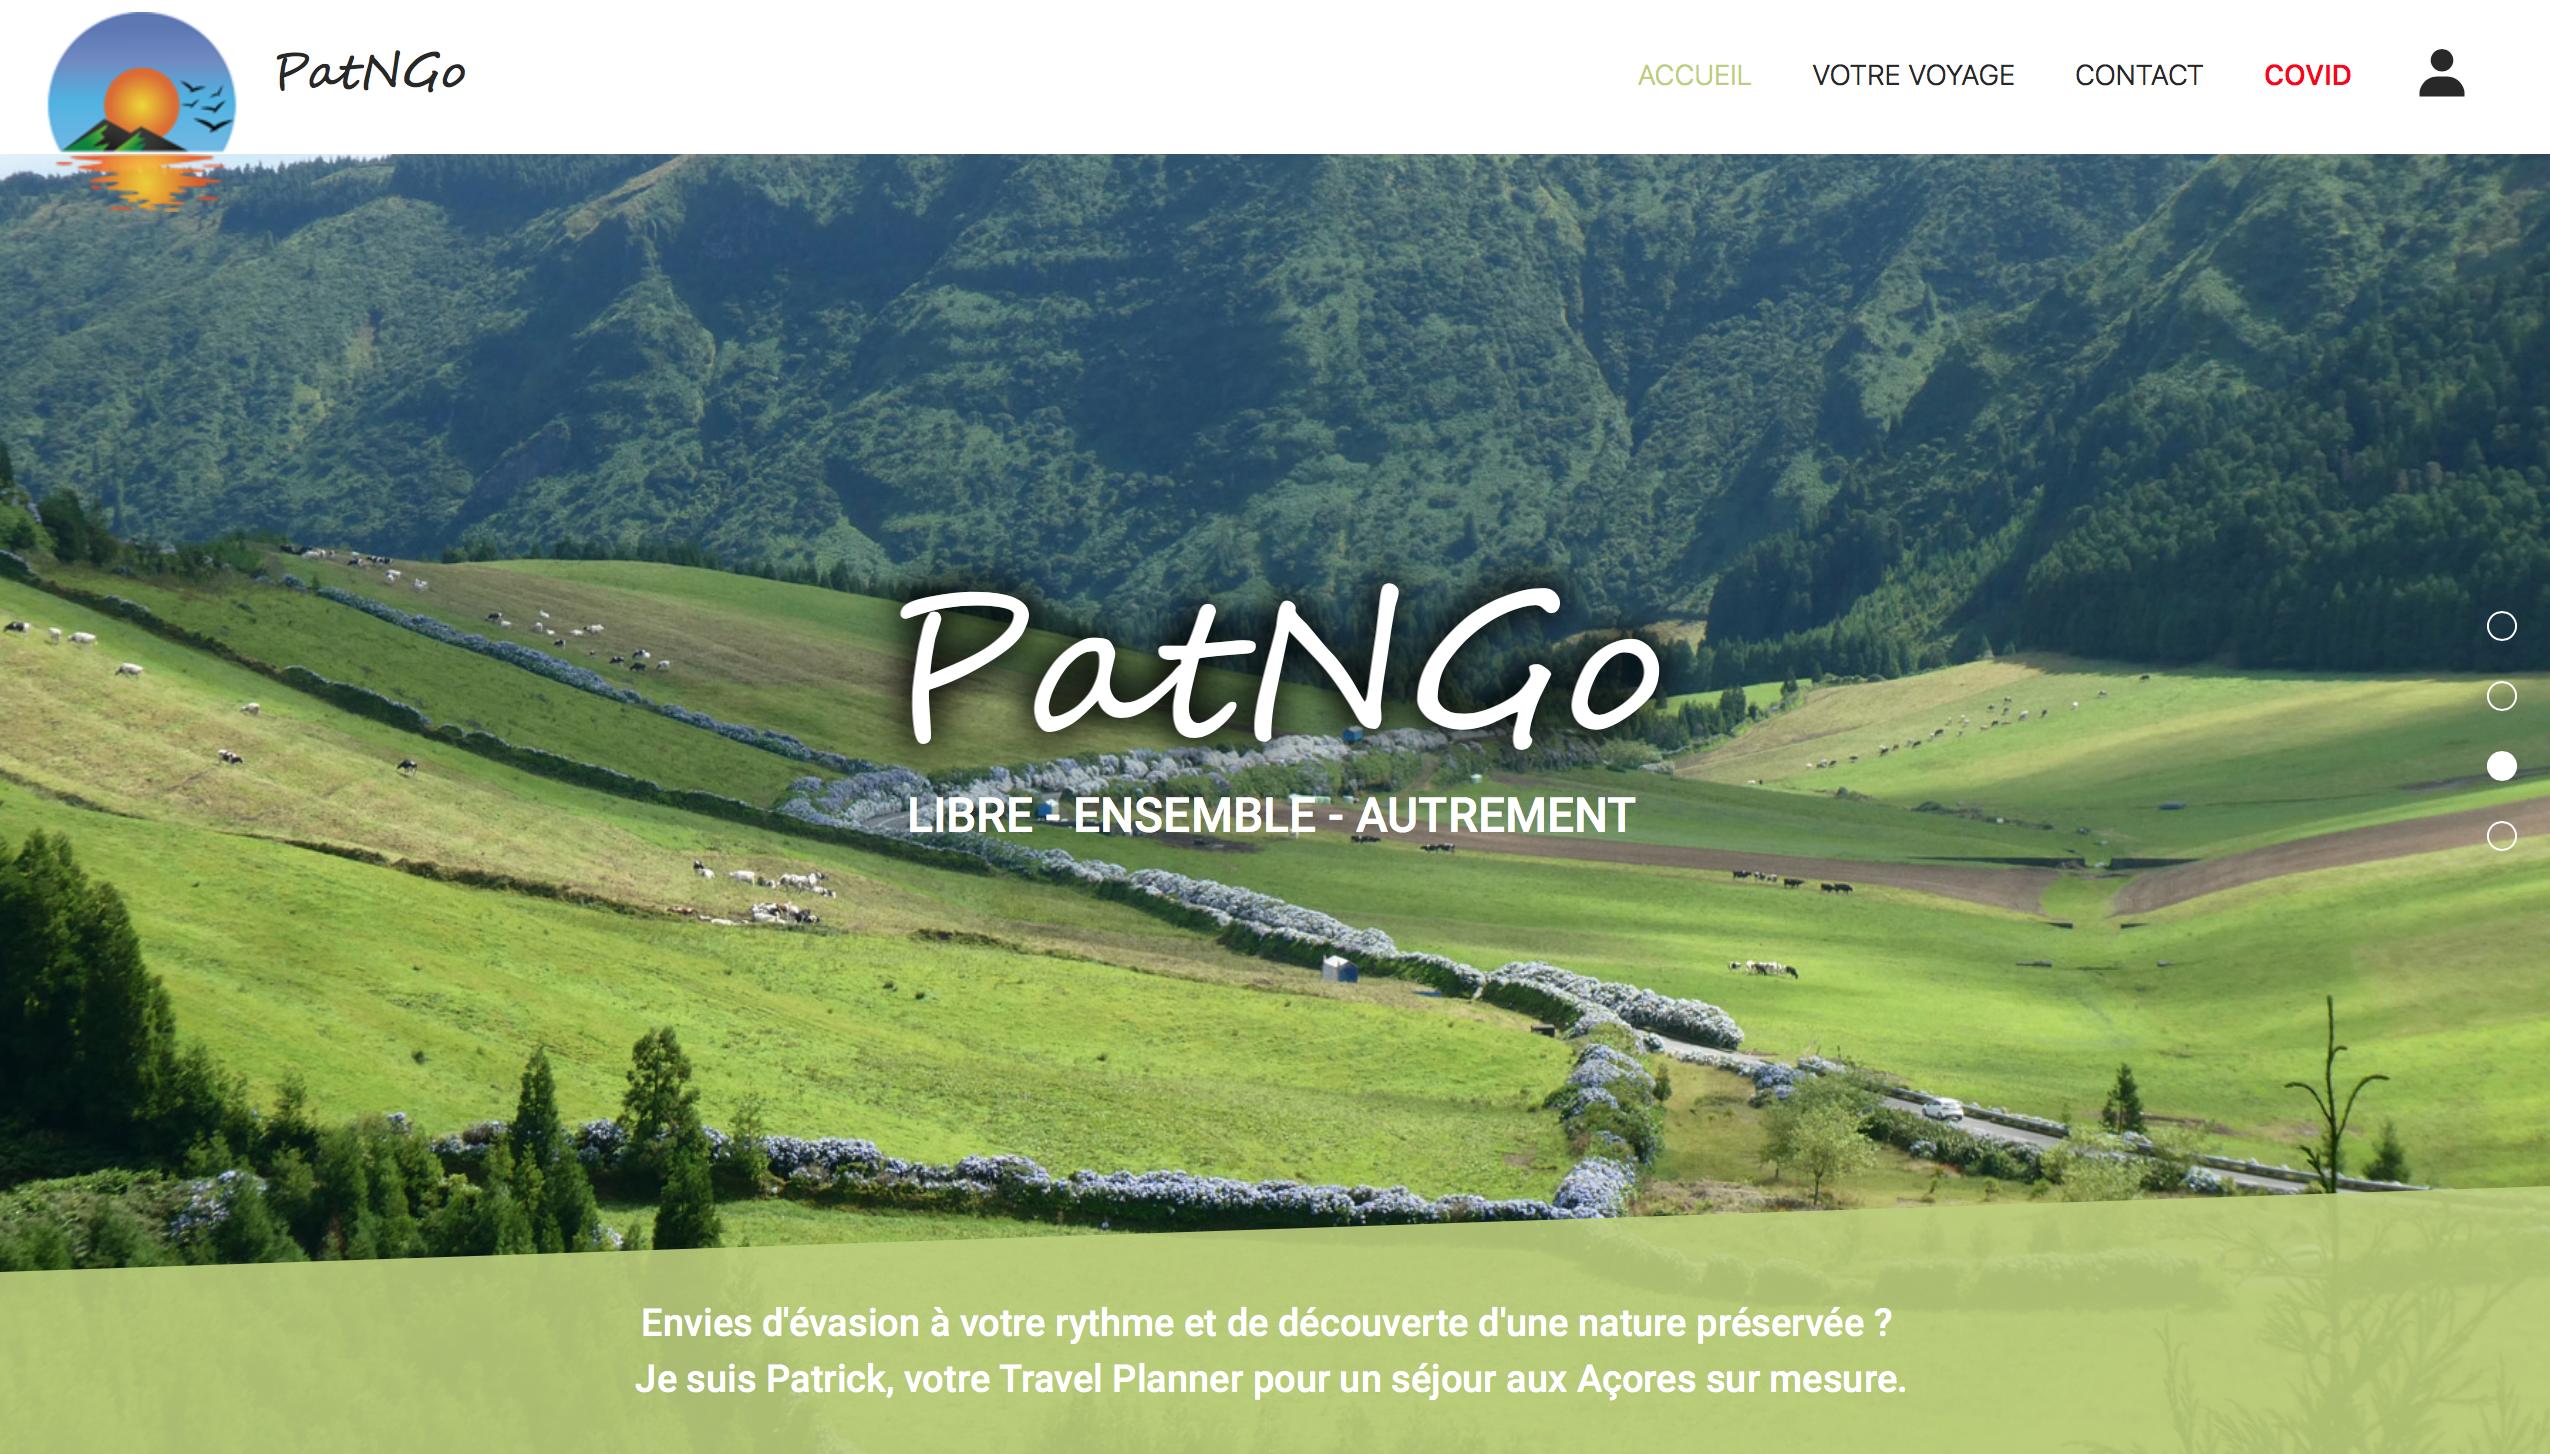 PatNgo